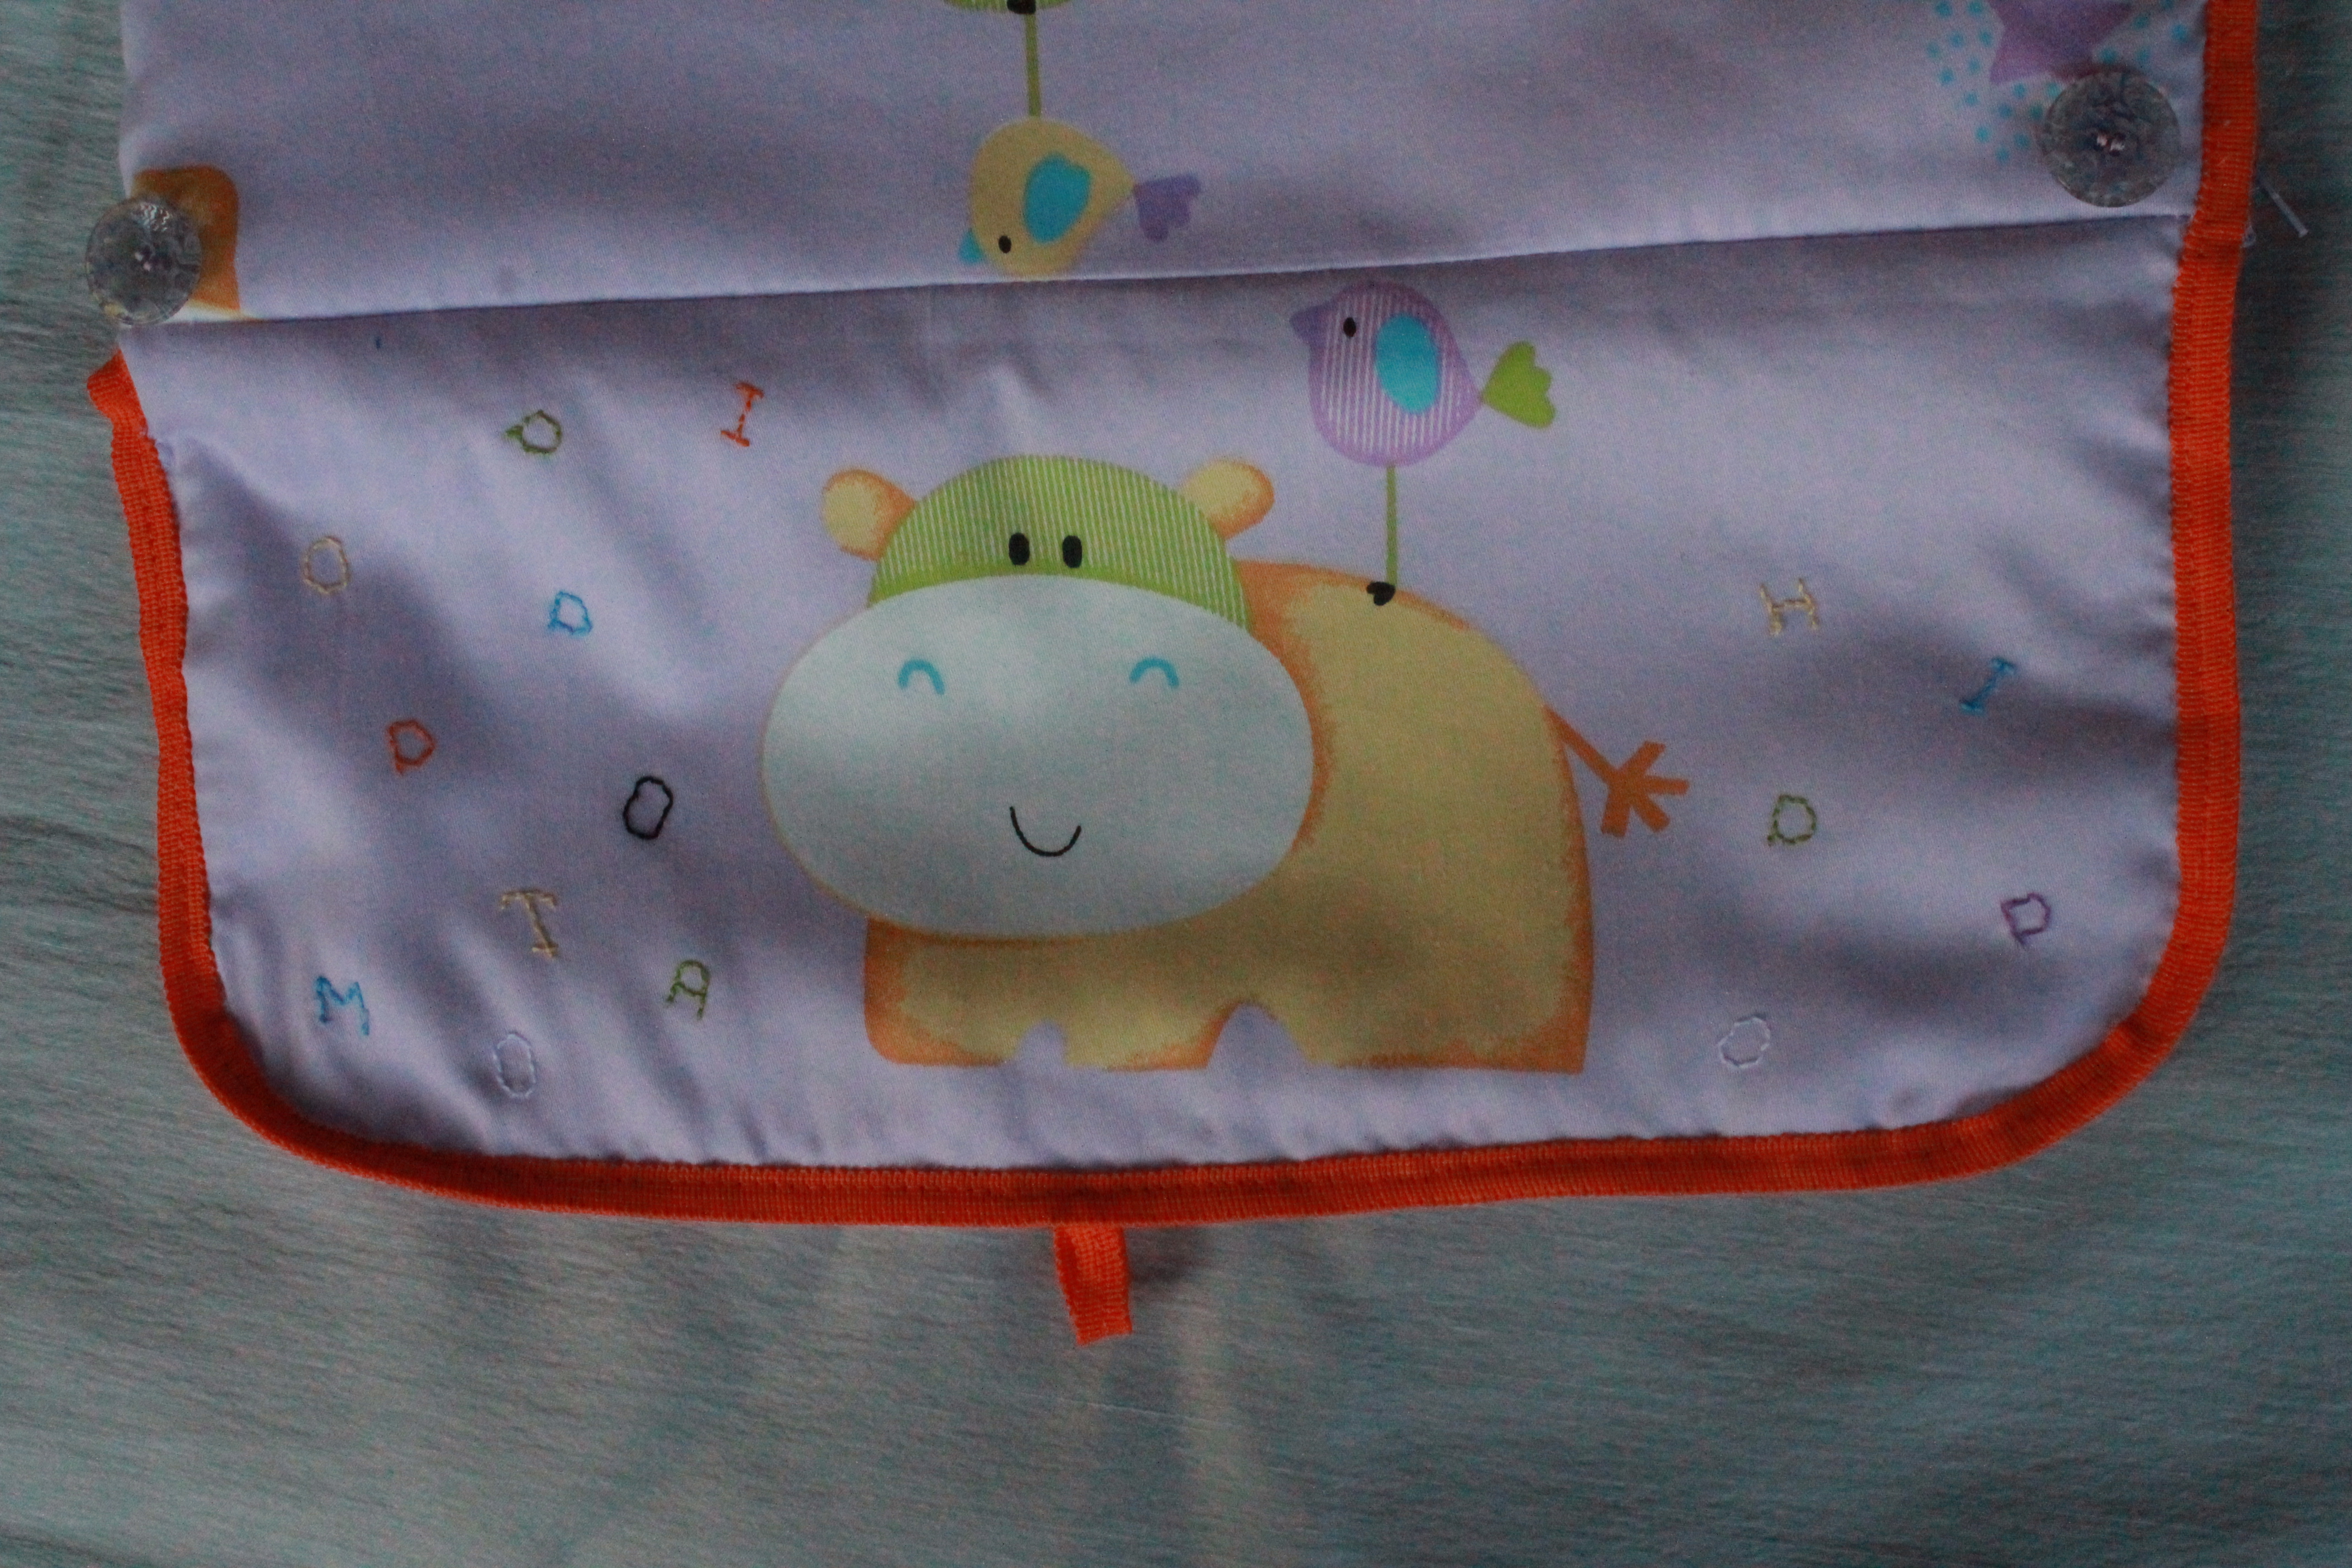 ippopotamo o hippo(abbrev. ing.)